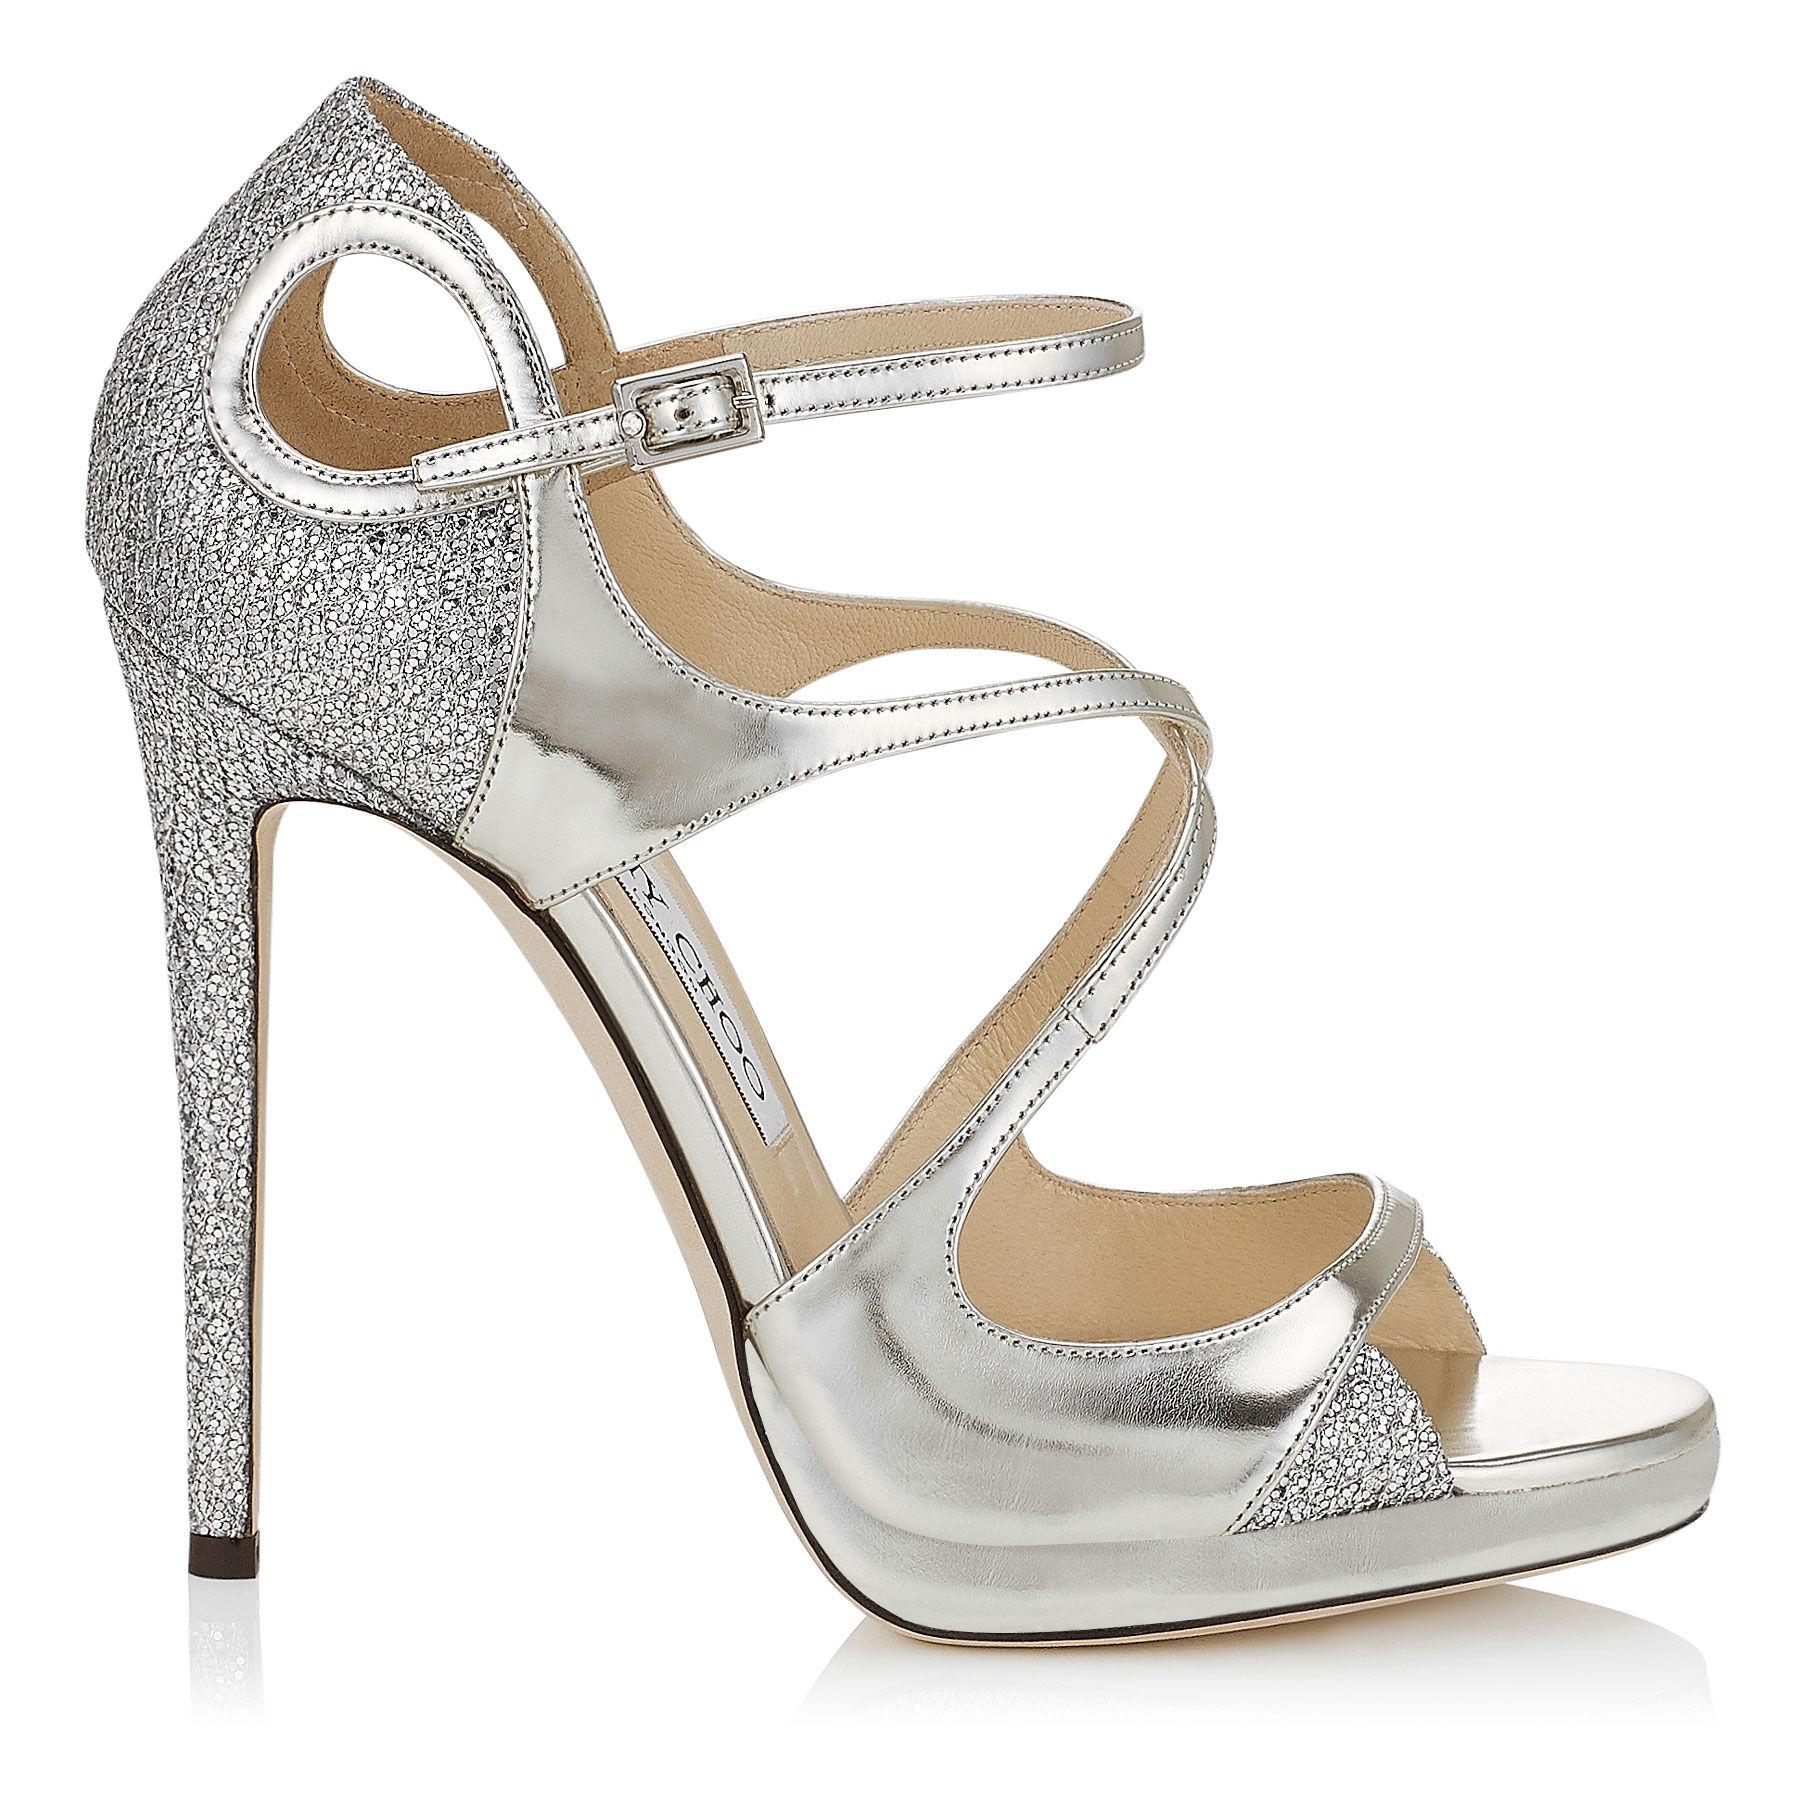 Scarpe Argento Sposa.Sandali Sposa Argento 2016 Shoeplay Fashion Blog Di Scarpe Da Donna